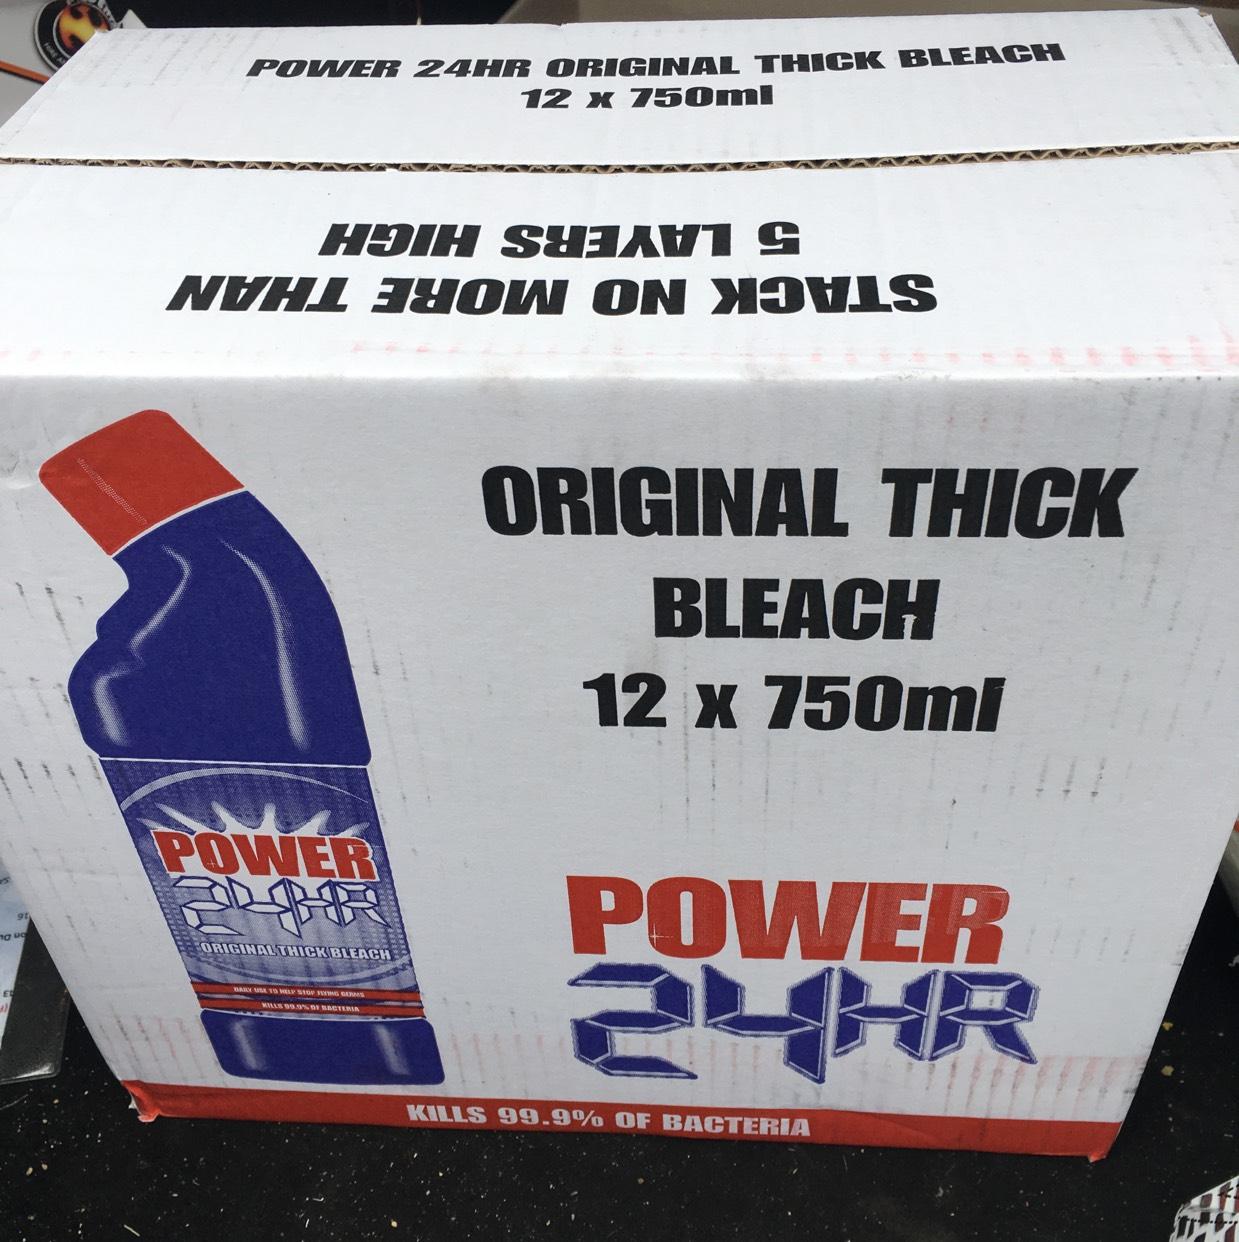 Power 24hr bleach 12 X 750 £3.49 @ Costco instore